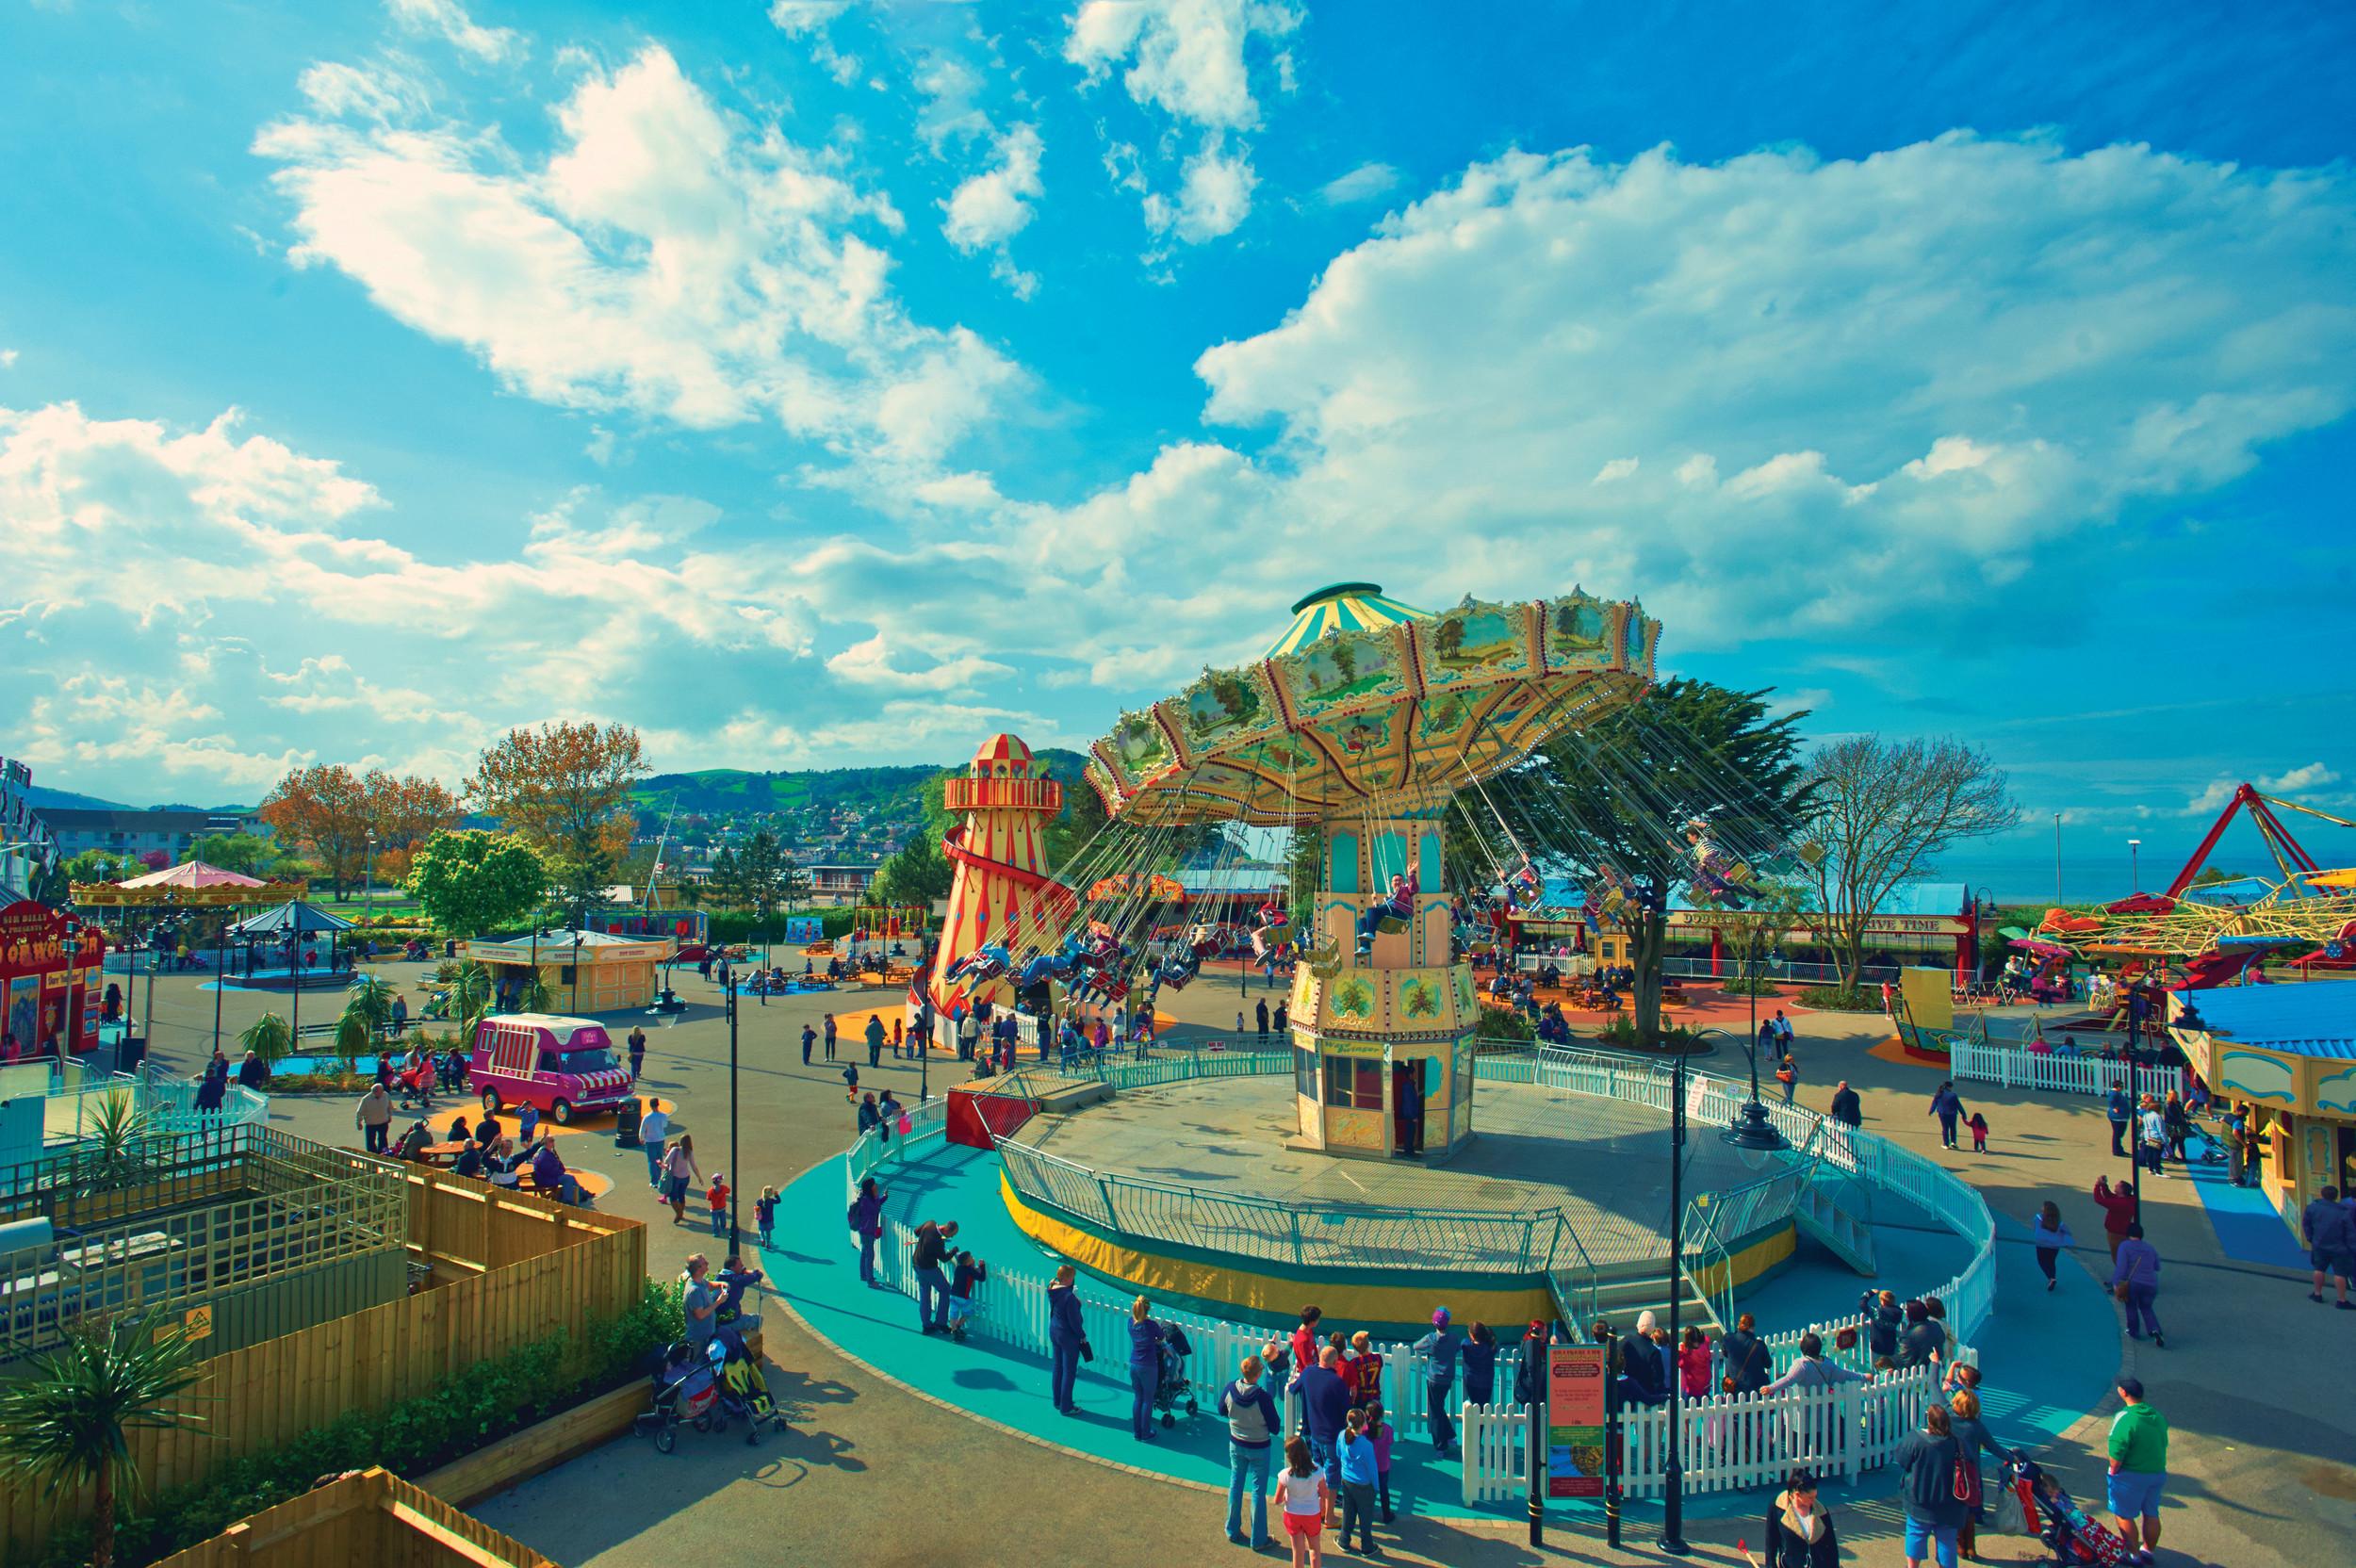 Butlin's Minehead Fairground